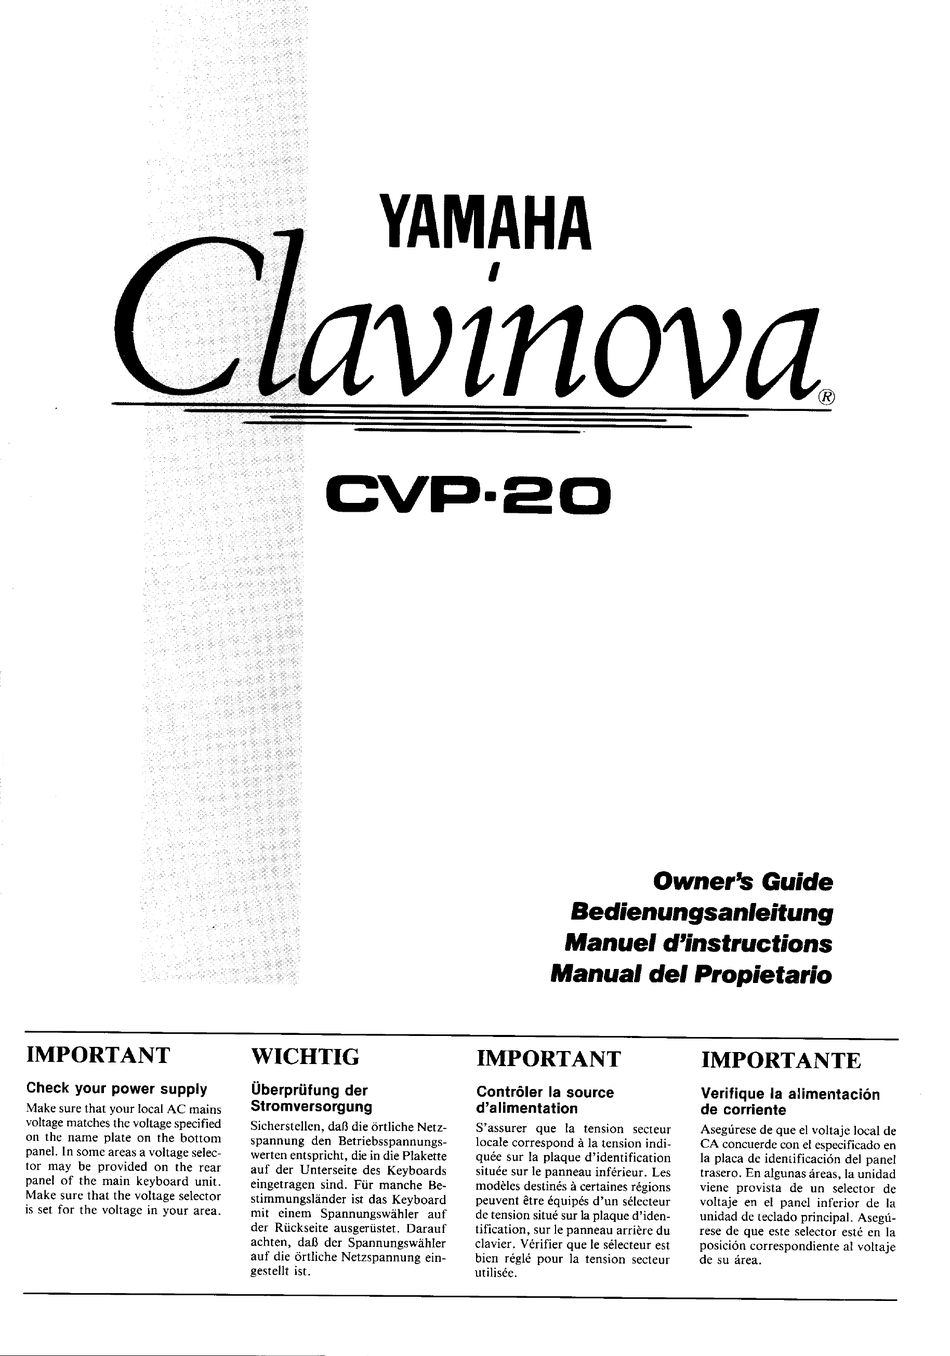 YAMAHA CLAVINOVA CVP-20 OWNER'S MANUAL Pdf Download